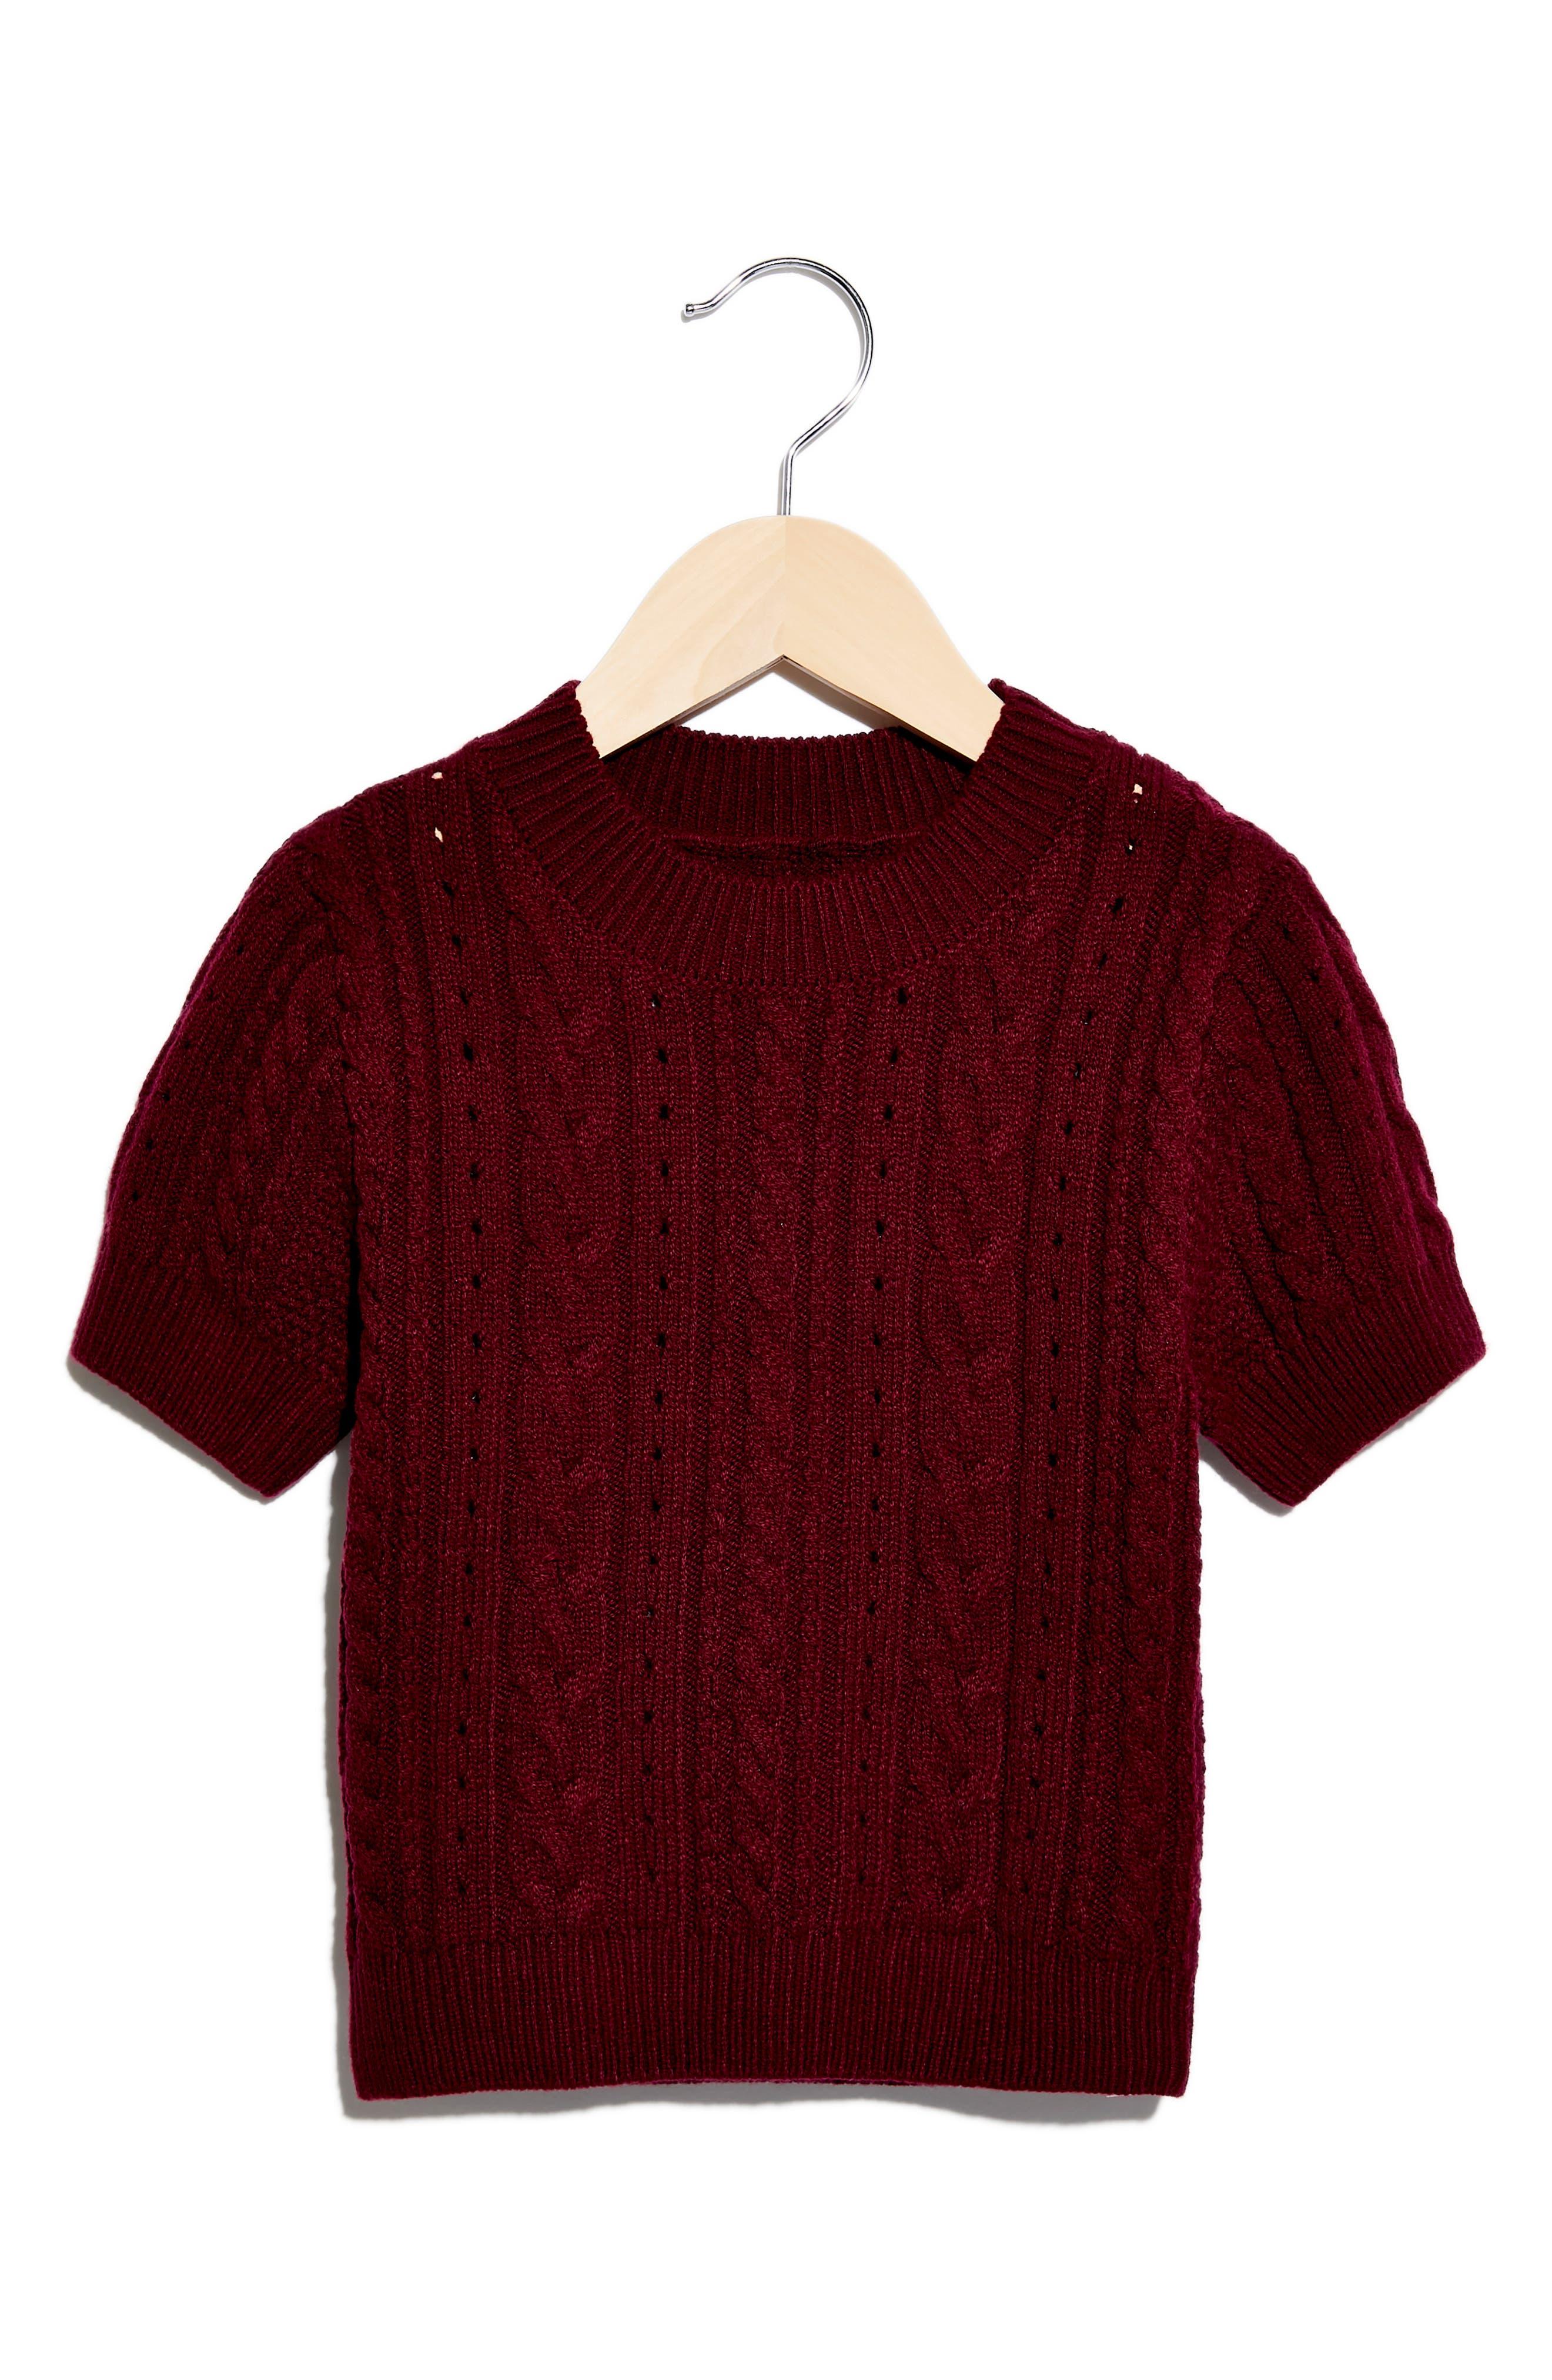 1940s Teenage Fashion: Girls Womens Free People Short  Sweet Crop Sweater Size Small - Purple $48.00 AT vintagedancer.com